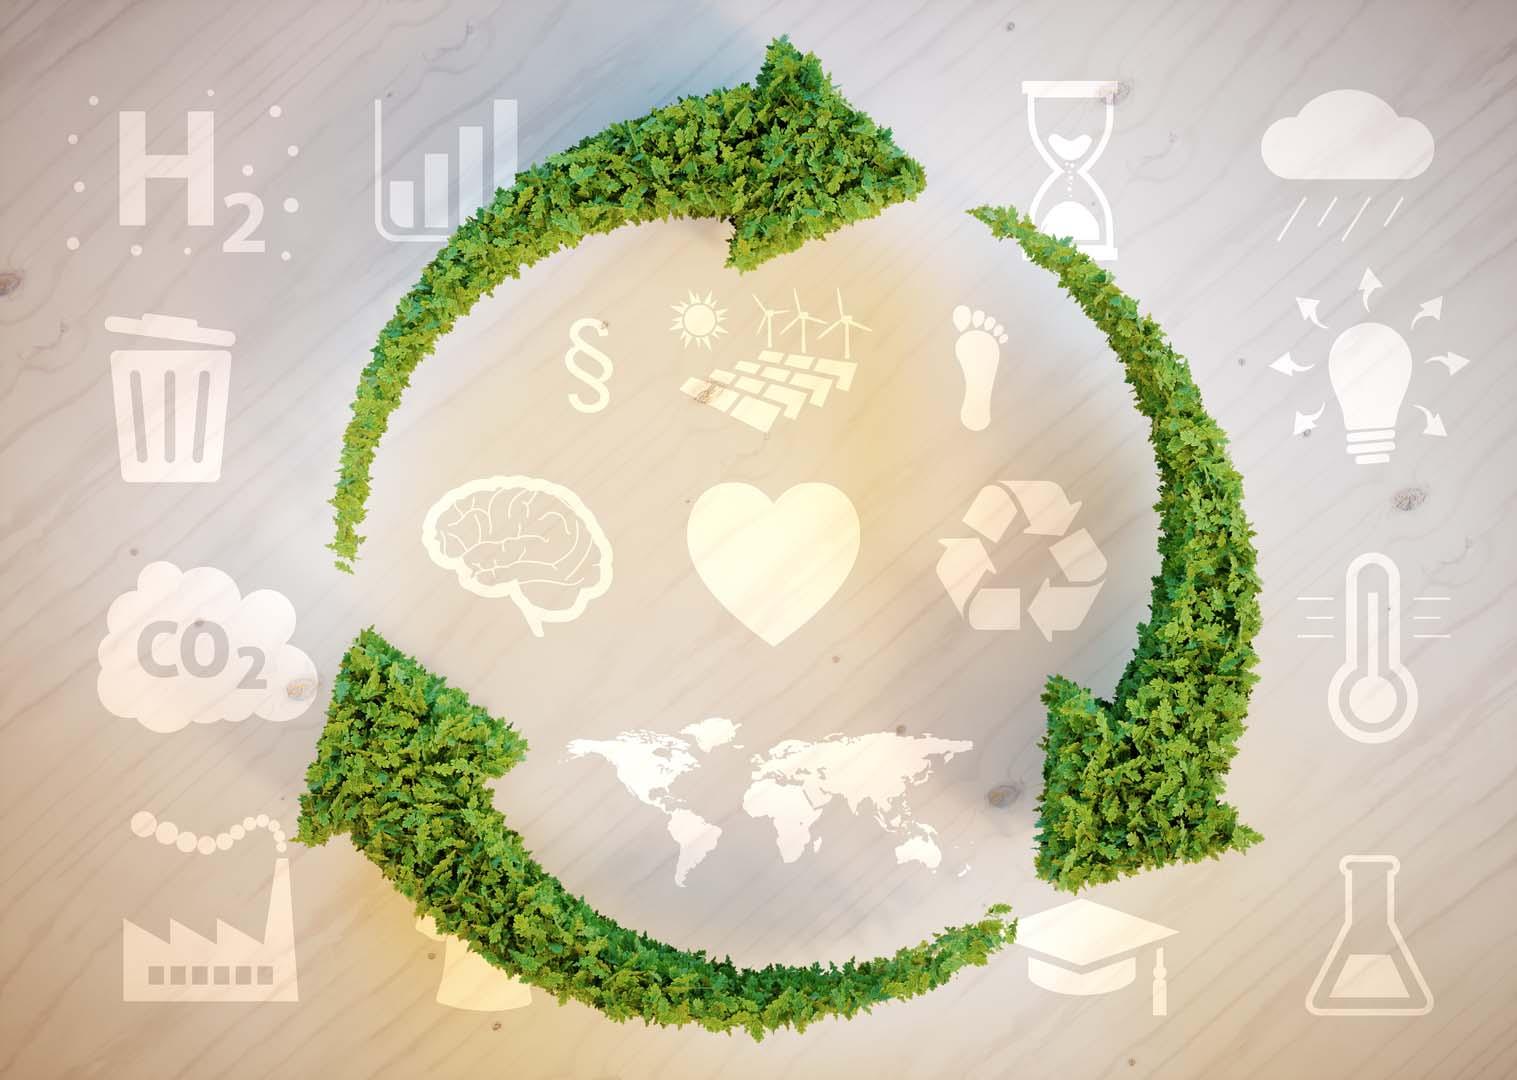 Emissioni di gas serra: il programma Interreg MED lancia la Call for Carbon Footprint Compensation Projects